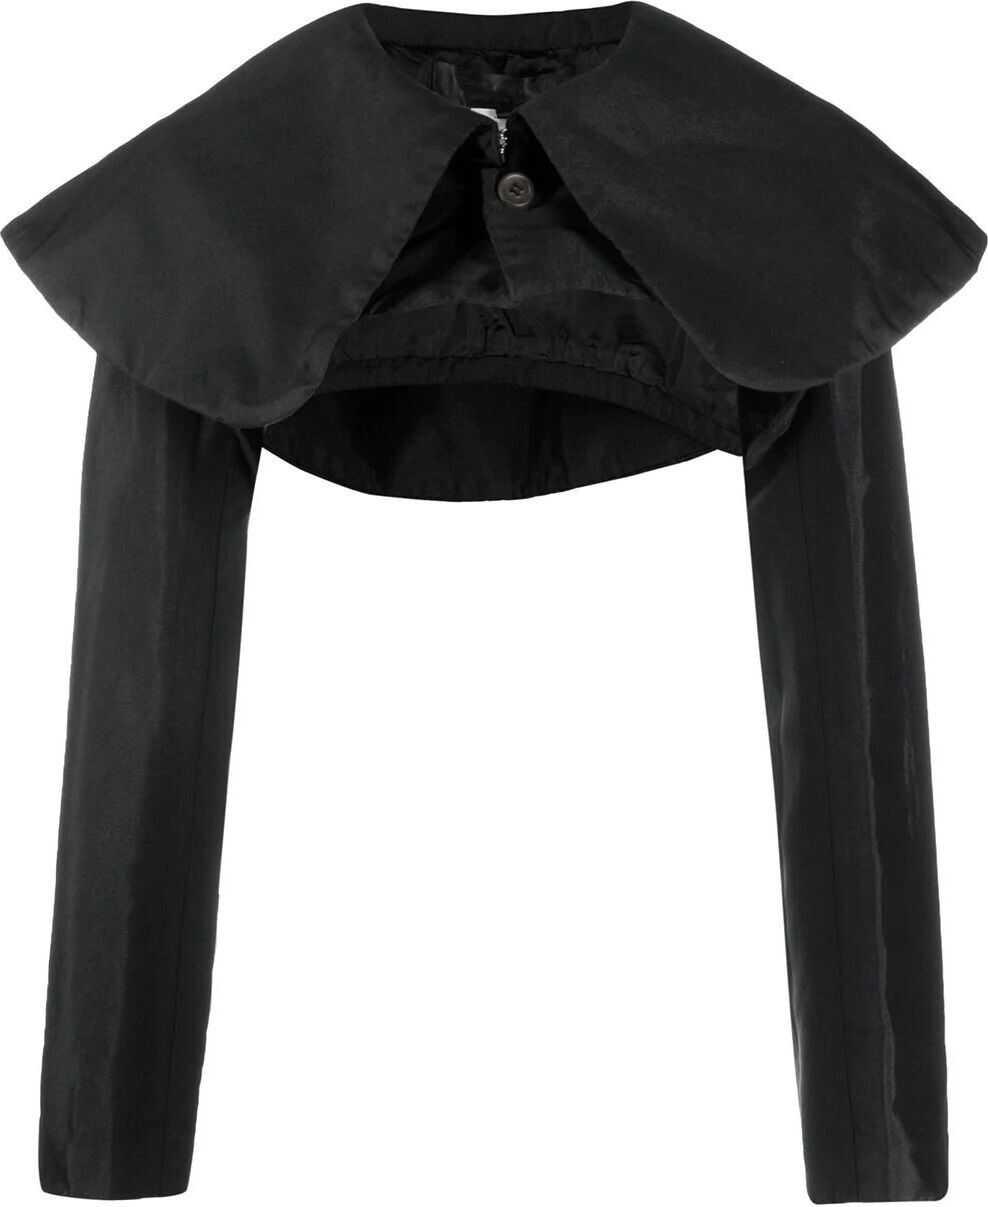 Comme des Garçons Polyester Outerwear Jacket BLACK